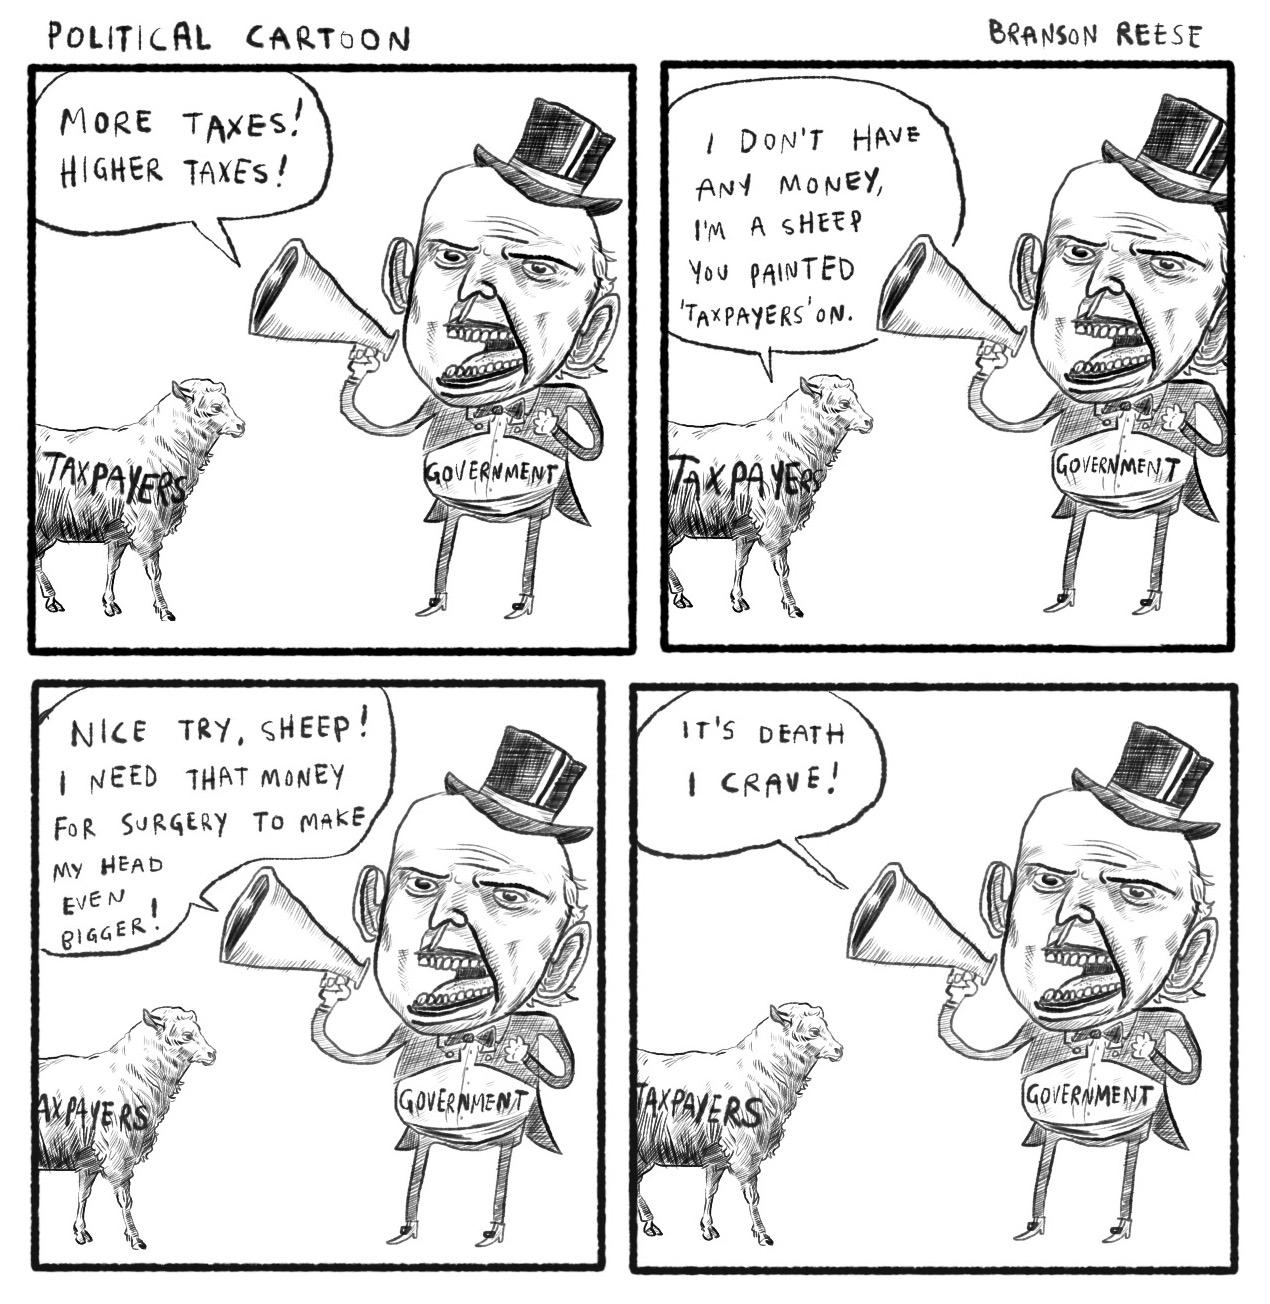 0035 politicalcartoon2.jpg